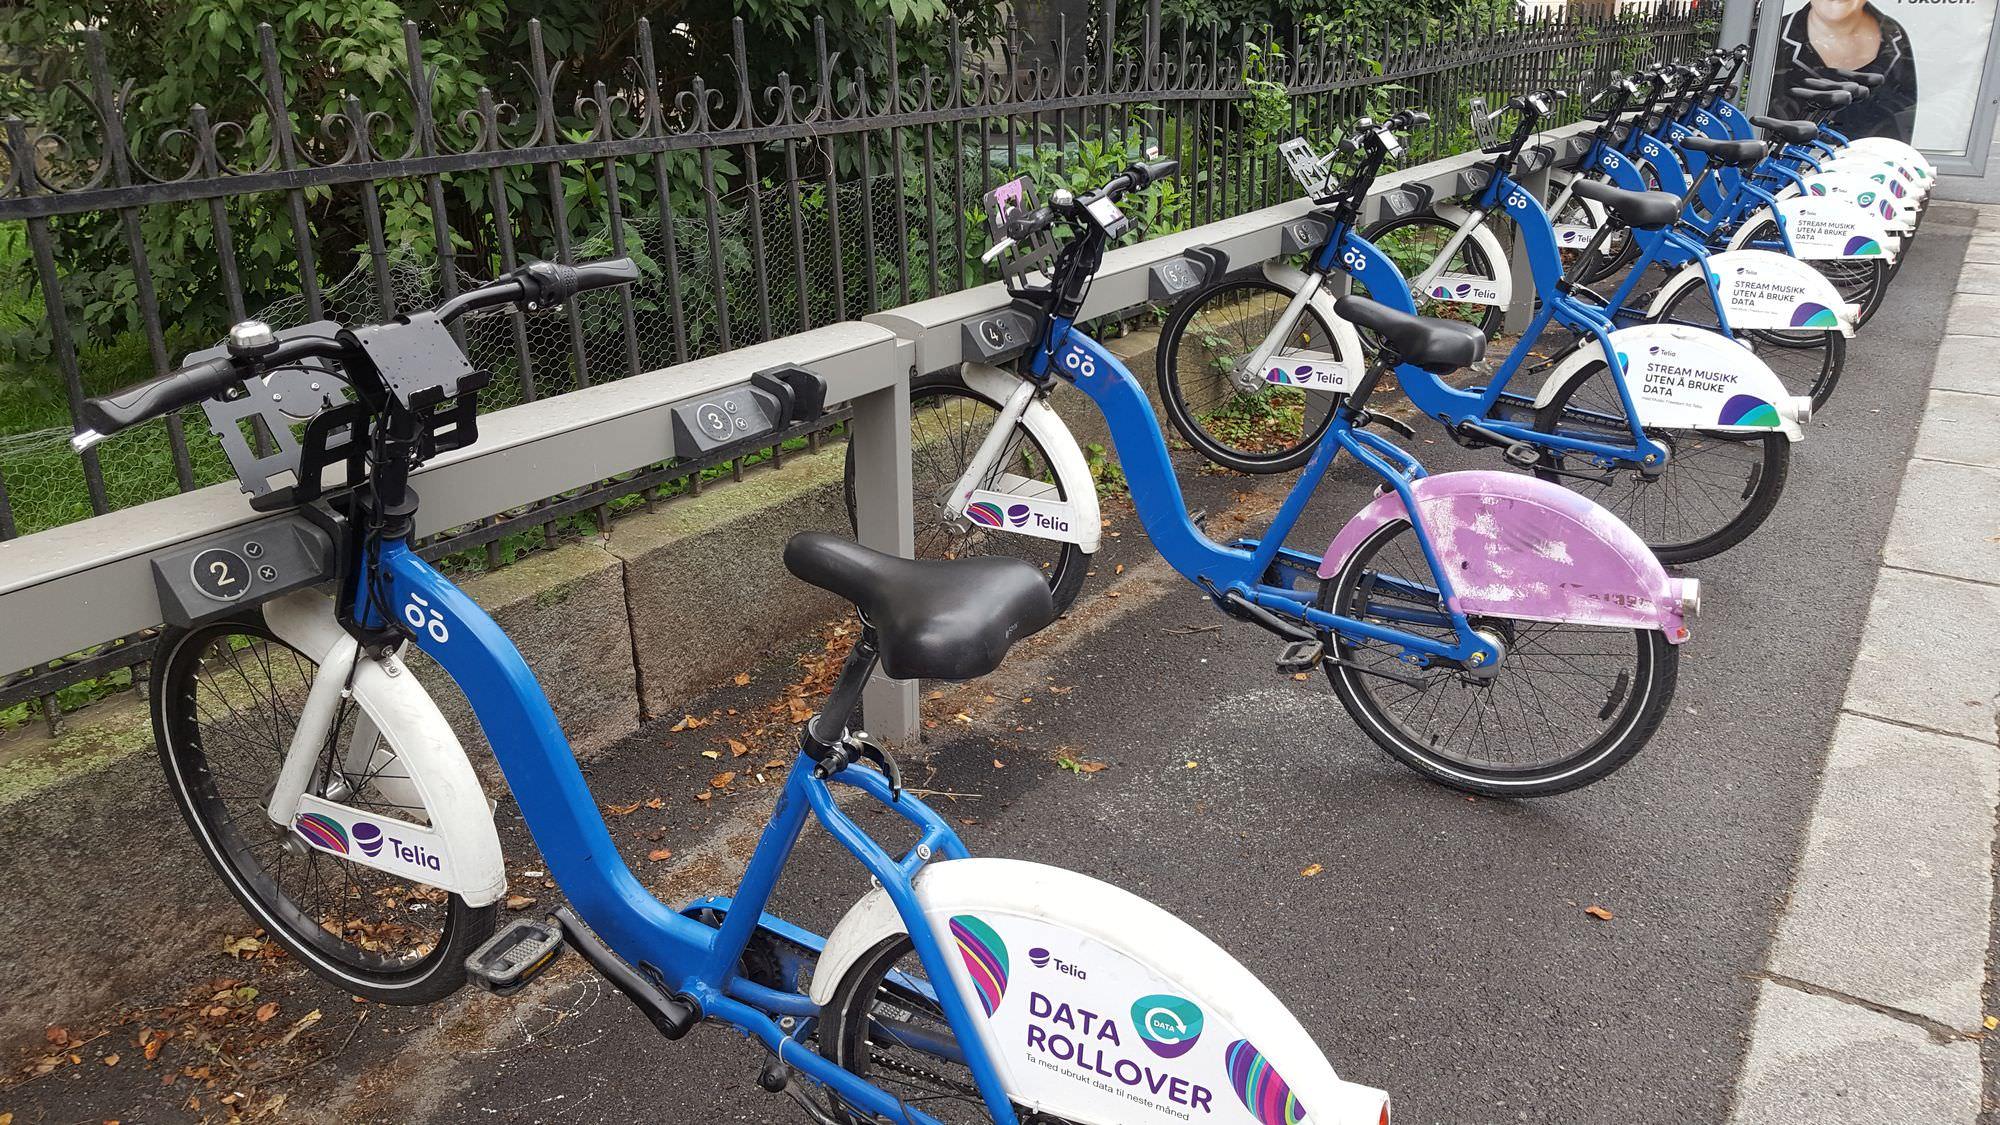 Syklistaksjon 2019